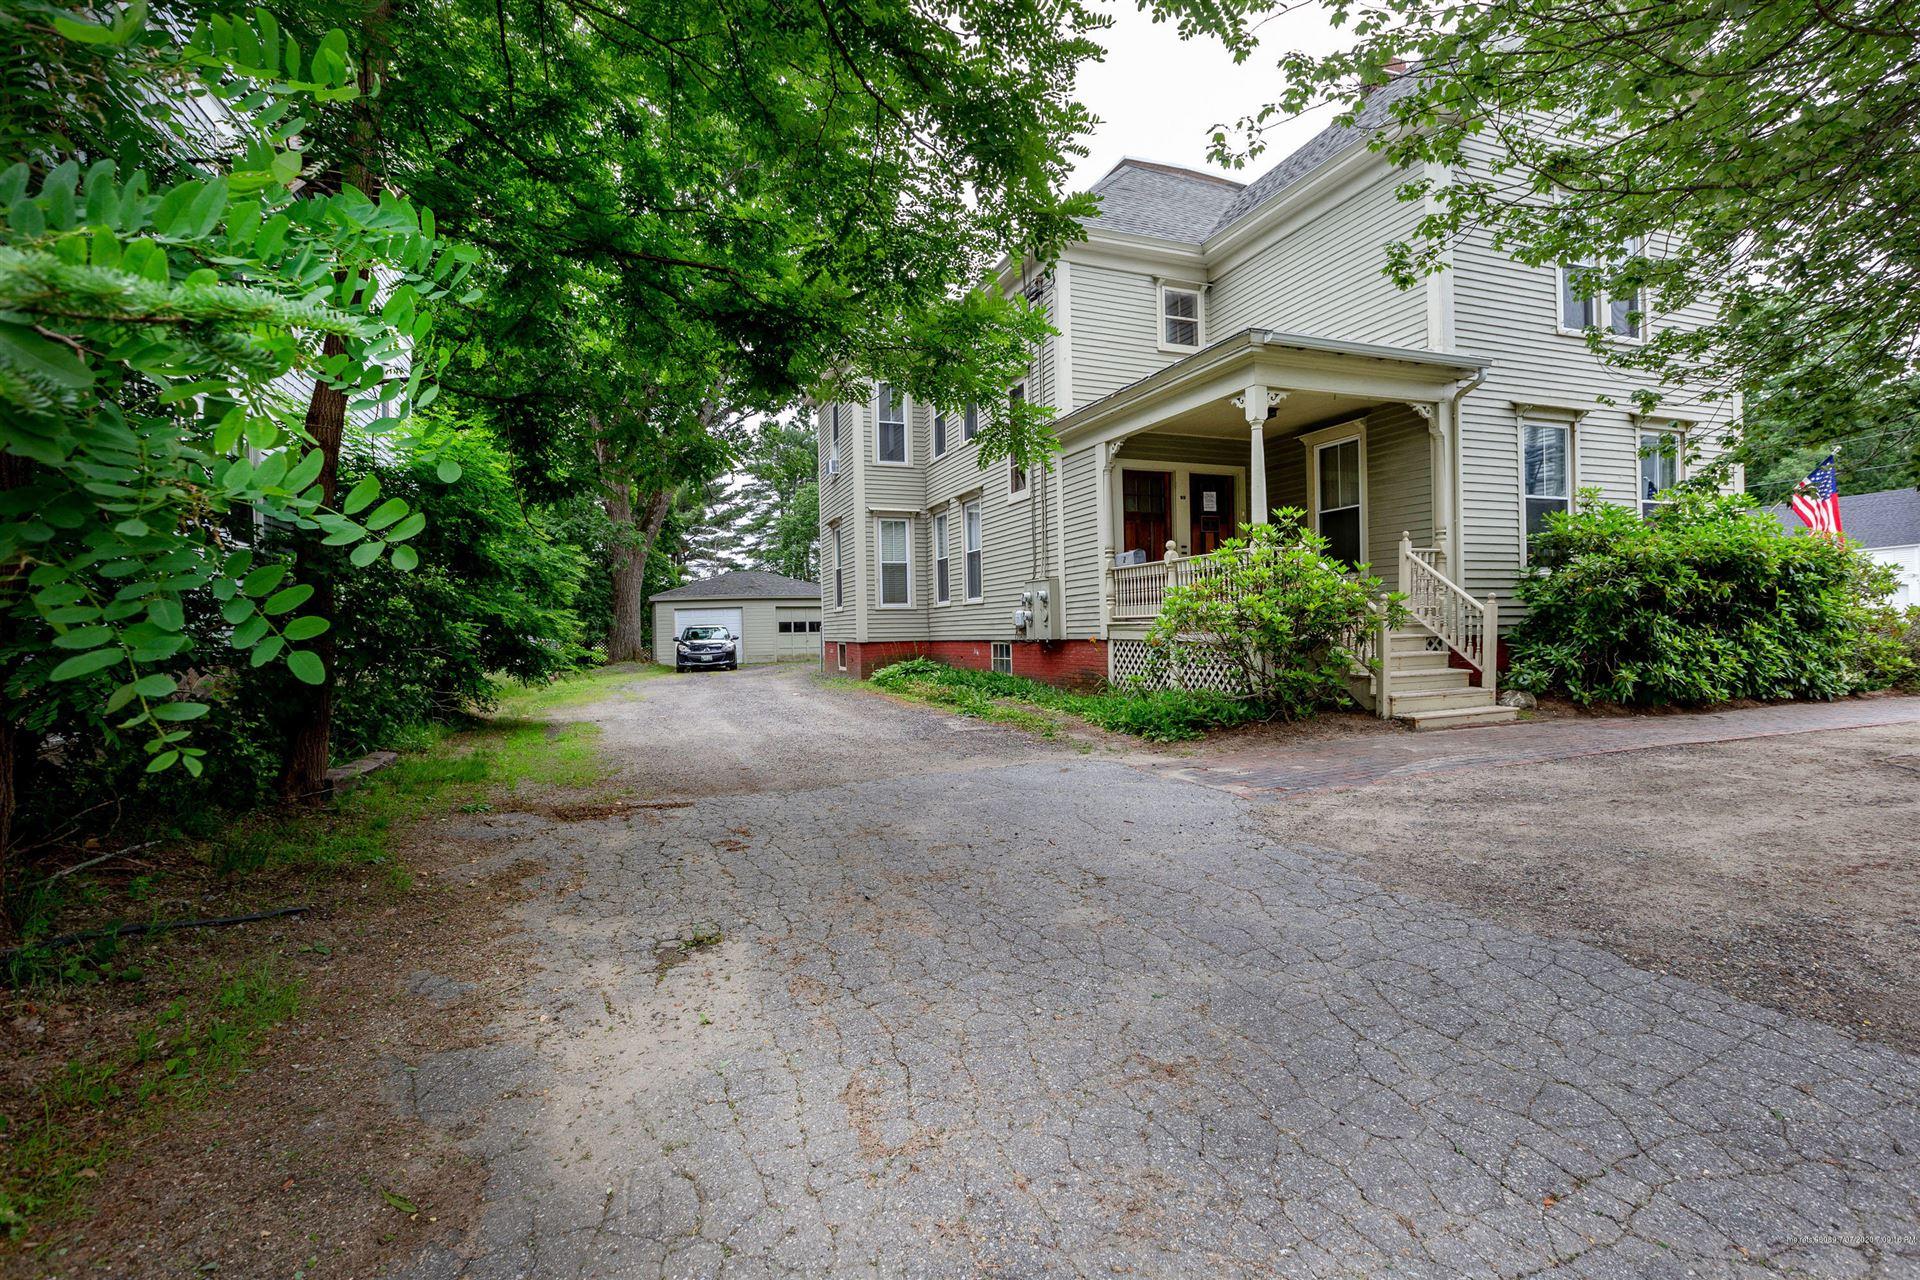 Photo of 93 Pleasant Street, Brunswick, ME 04011 (MLS # 1459355)